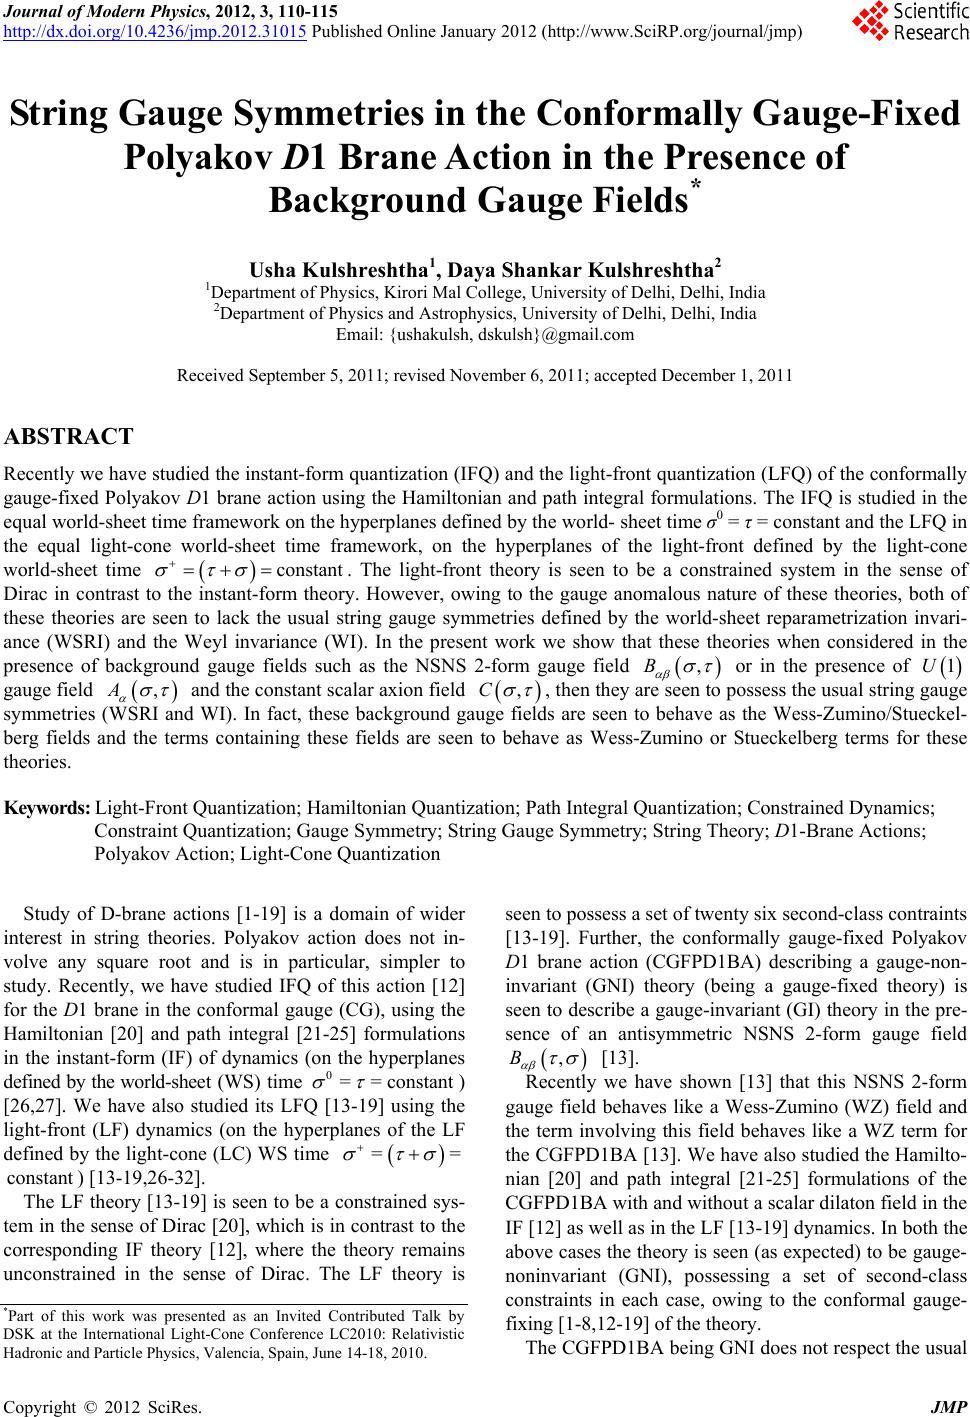 Polyakov gauge fields and strings djvu to pdf